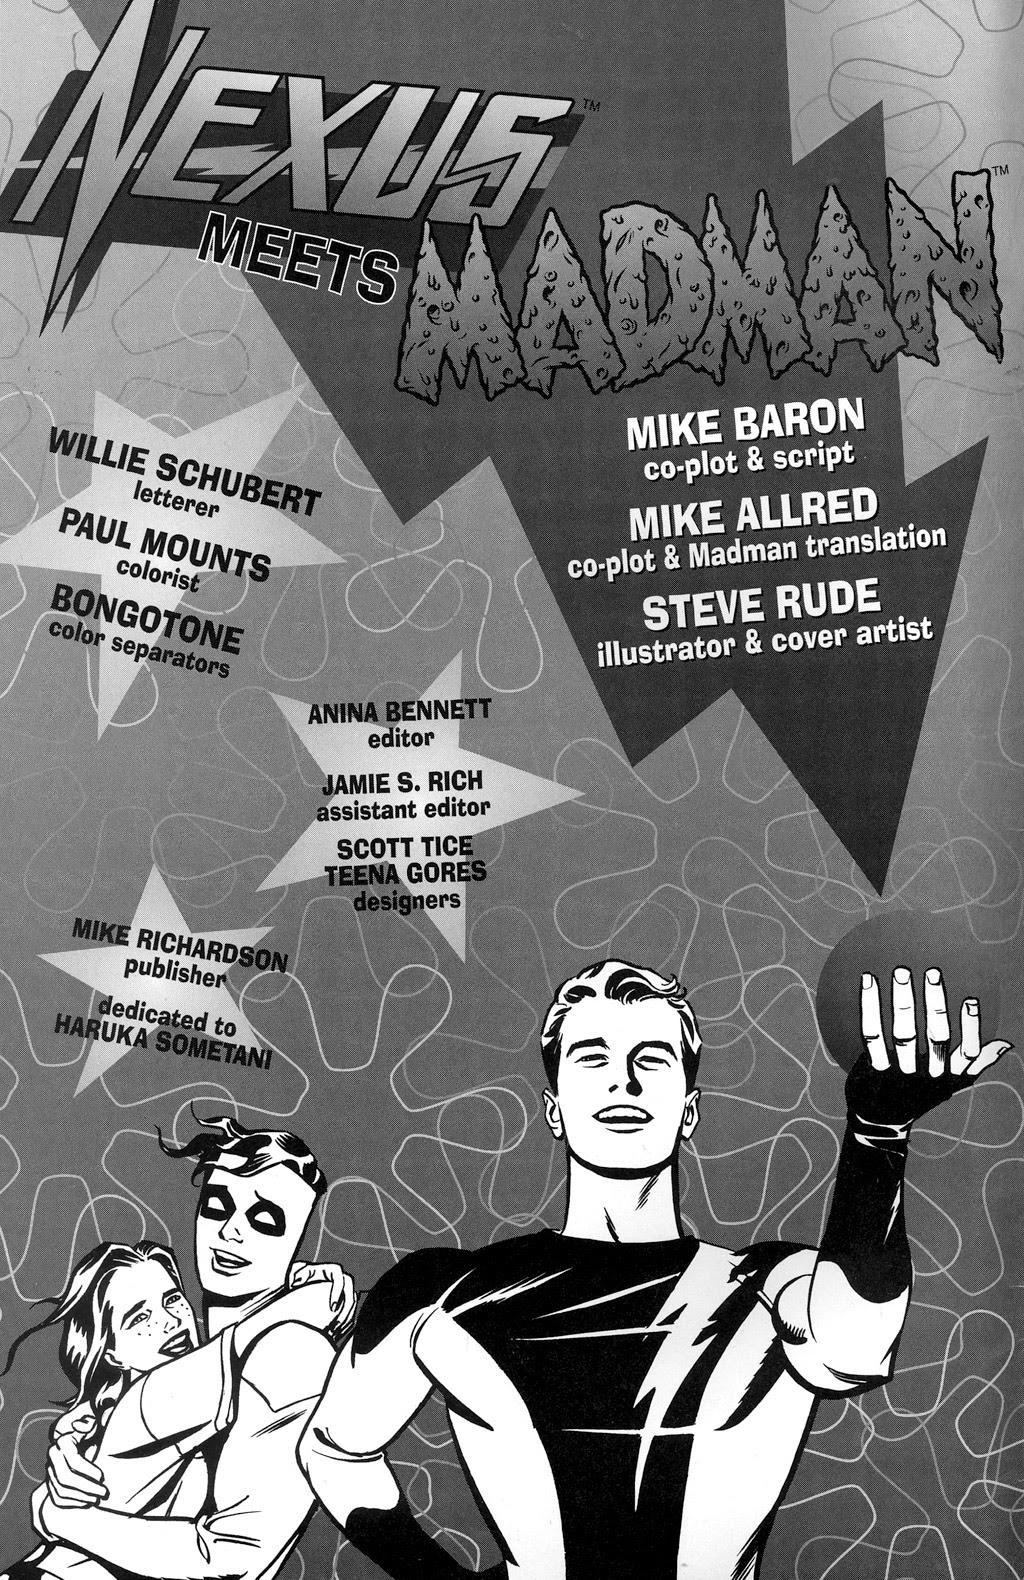 Read online Nexus Meets Madman comic -  Issue # Full - 2